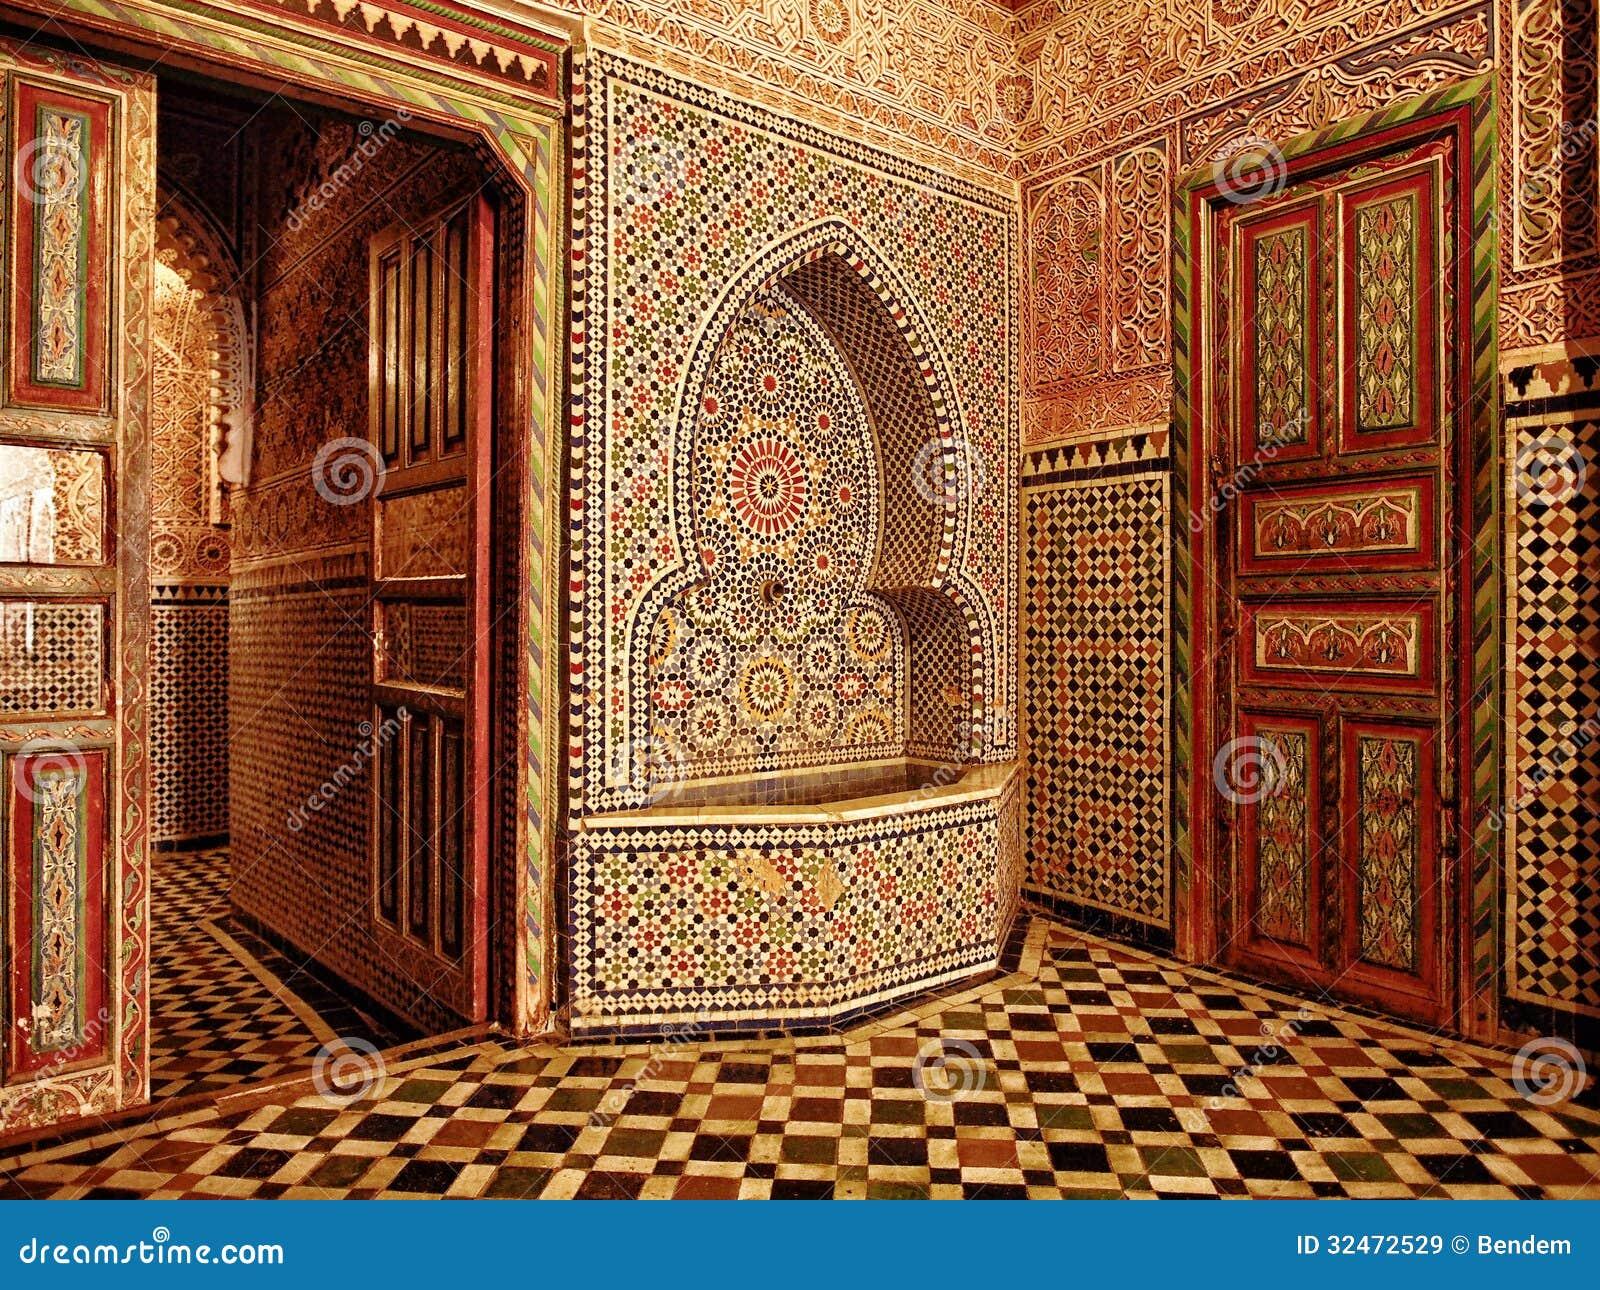 moroccan doorway entrance stock image image of arabic